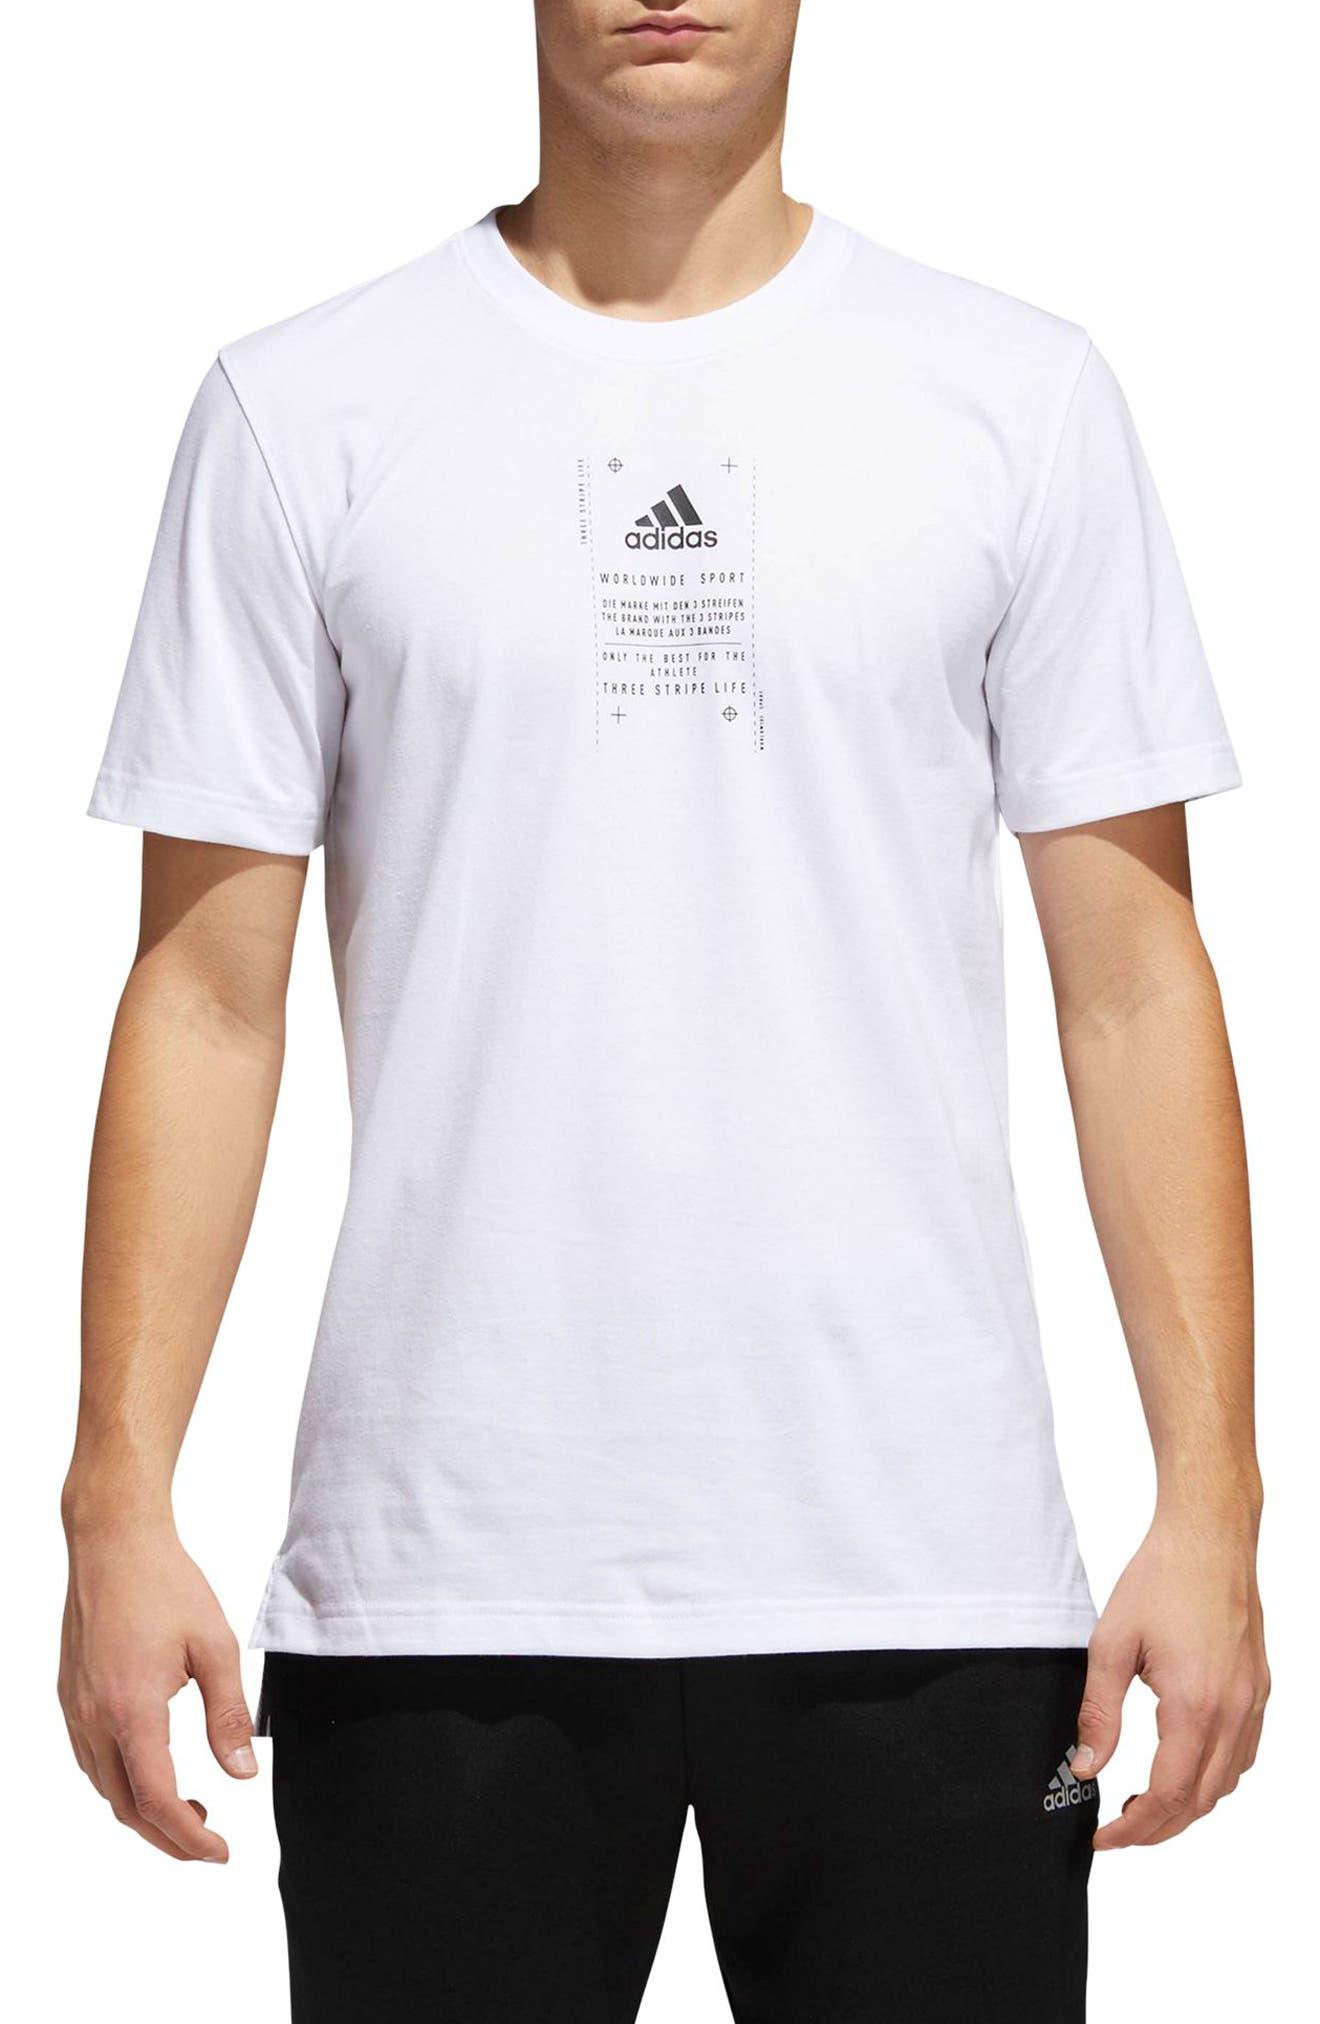 BOS Label T-Shirt,                             Main thumbnail 1, color,                             White / Black